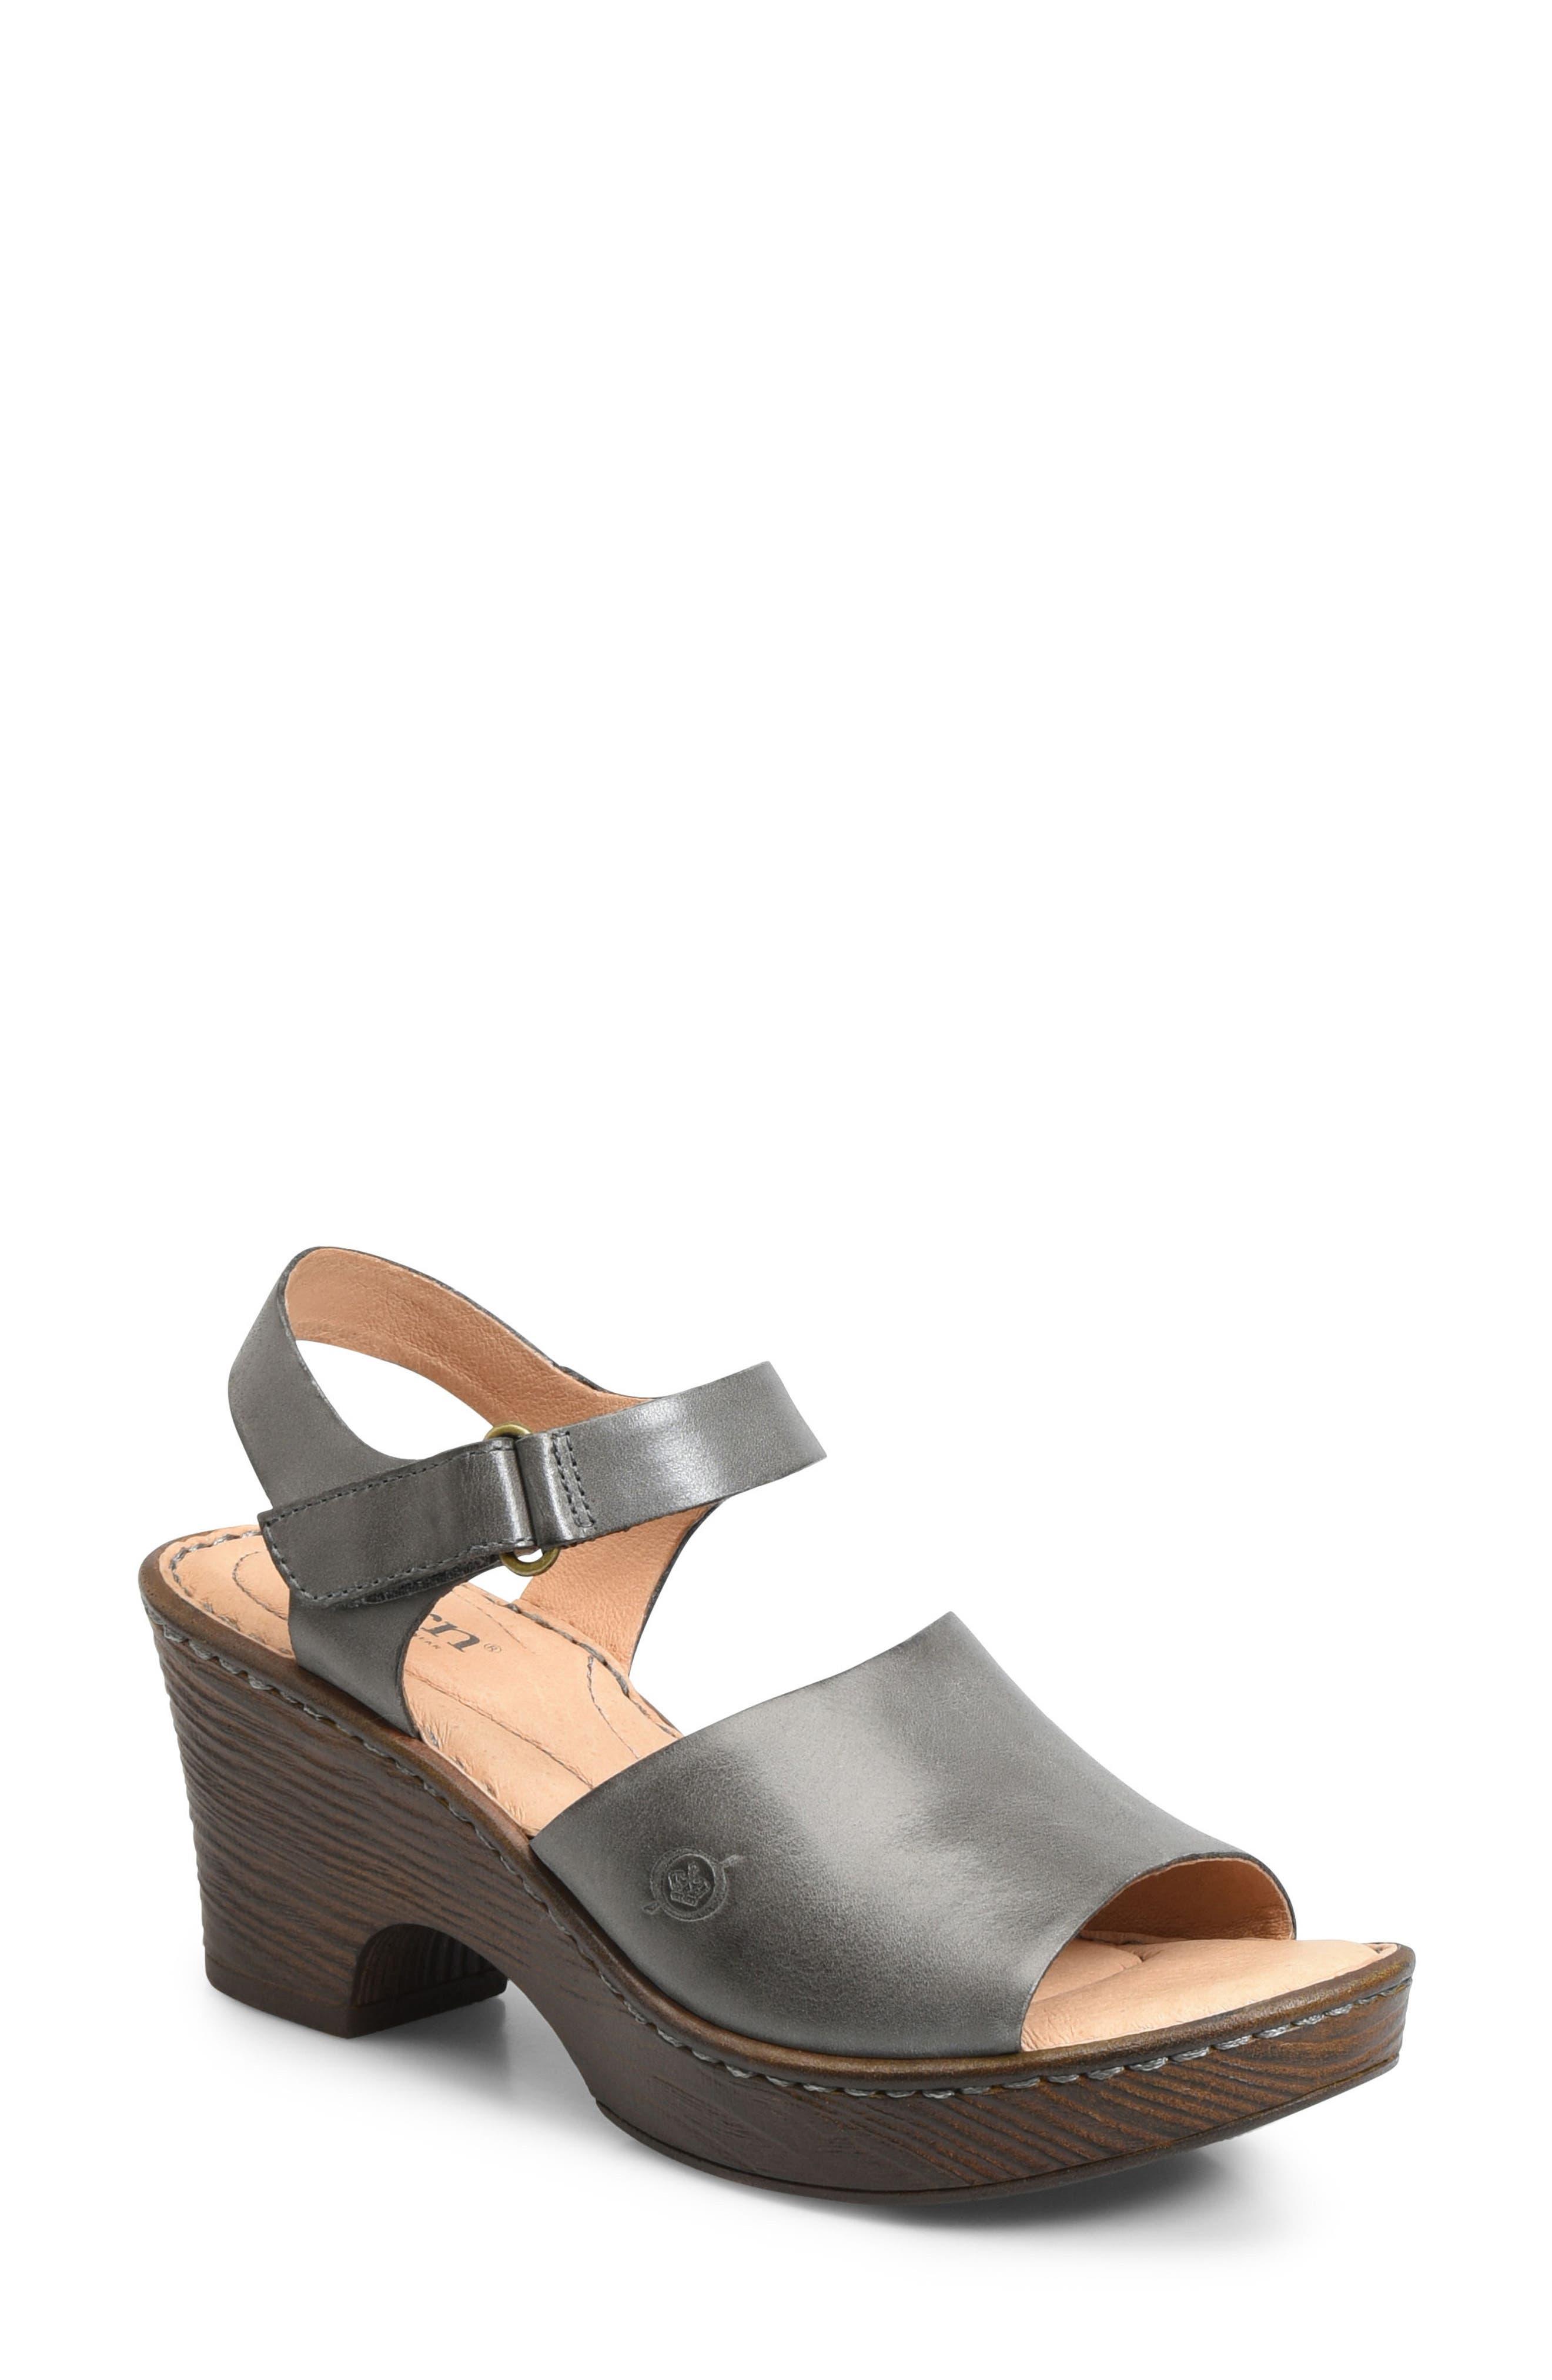 Canna Platform Sandal,                             Main thumbnail 1, color,                             Grey Leather